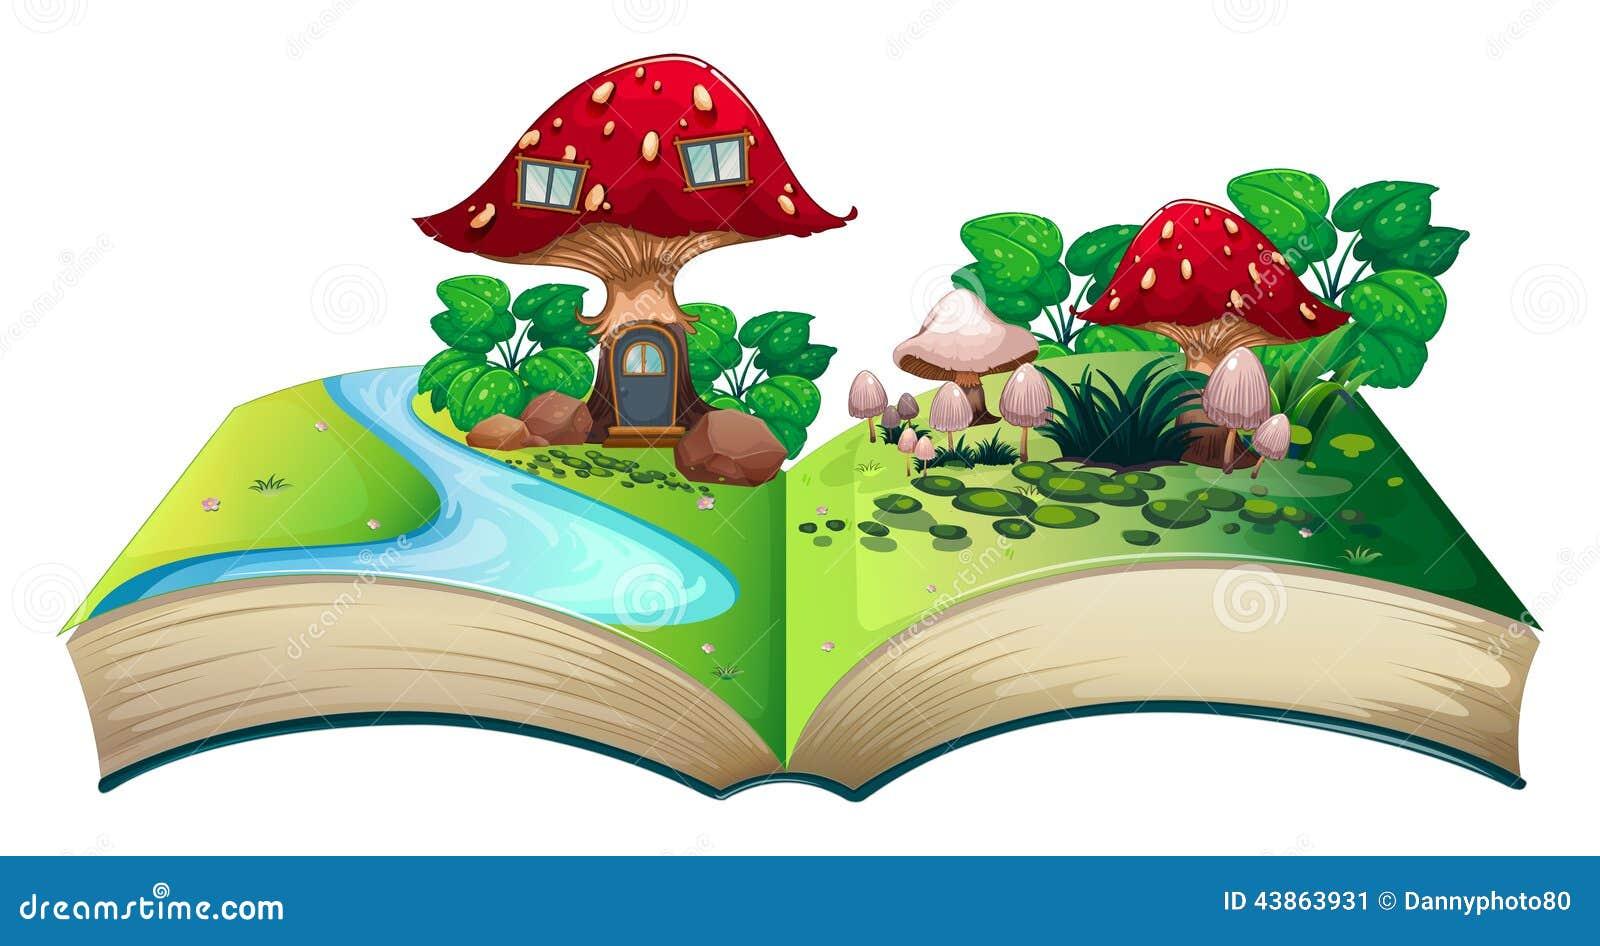 4 Bedroom House Plans 1 Story Mushroom Popup Book Stock Vector Illustration Of